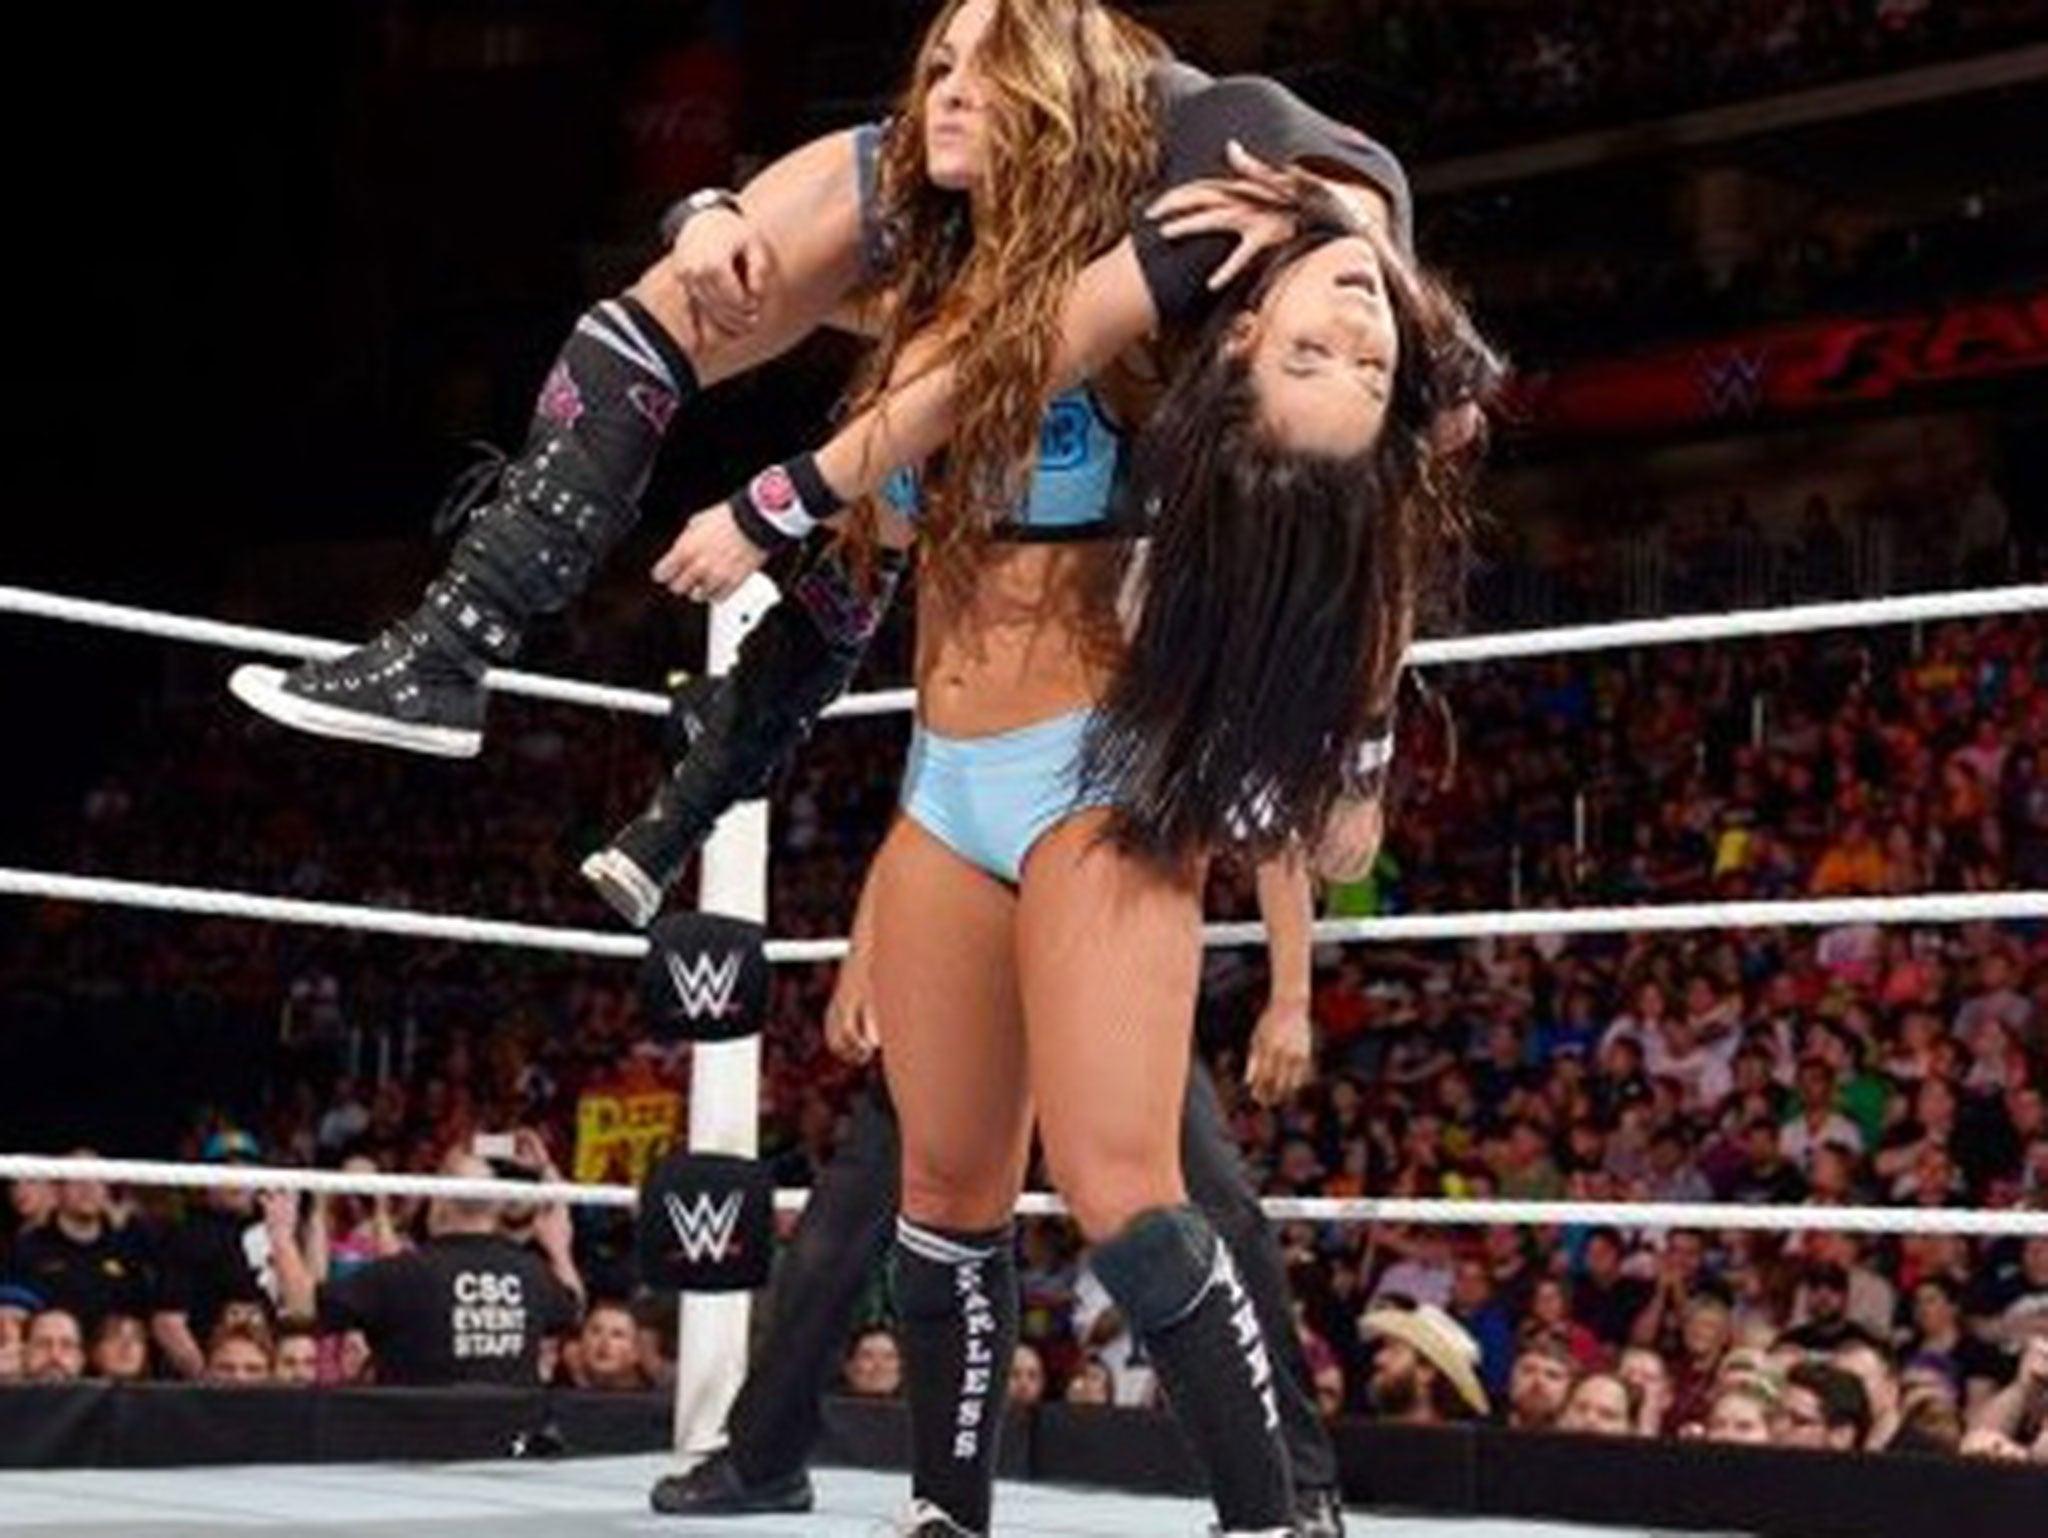 Wwe S John Bradshaw Layfield Says Nikki Bella S Punch On